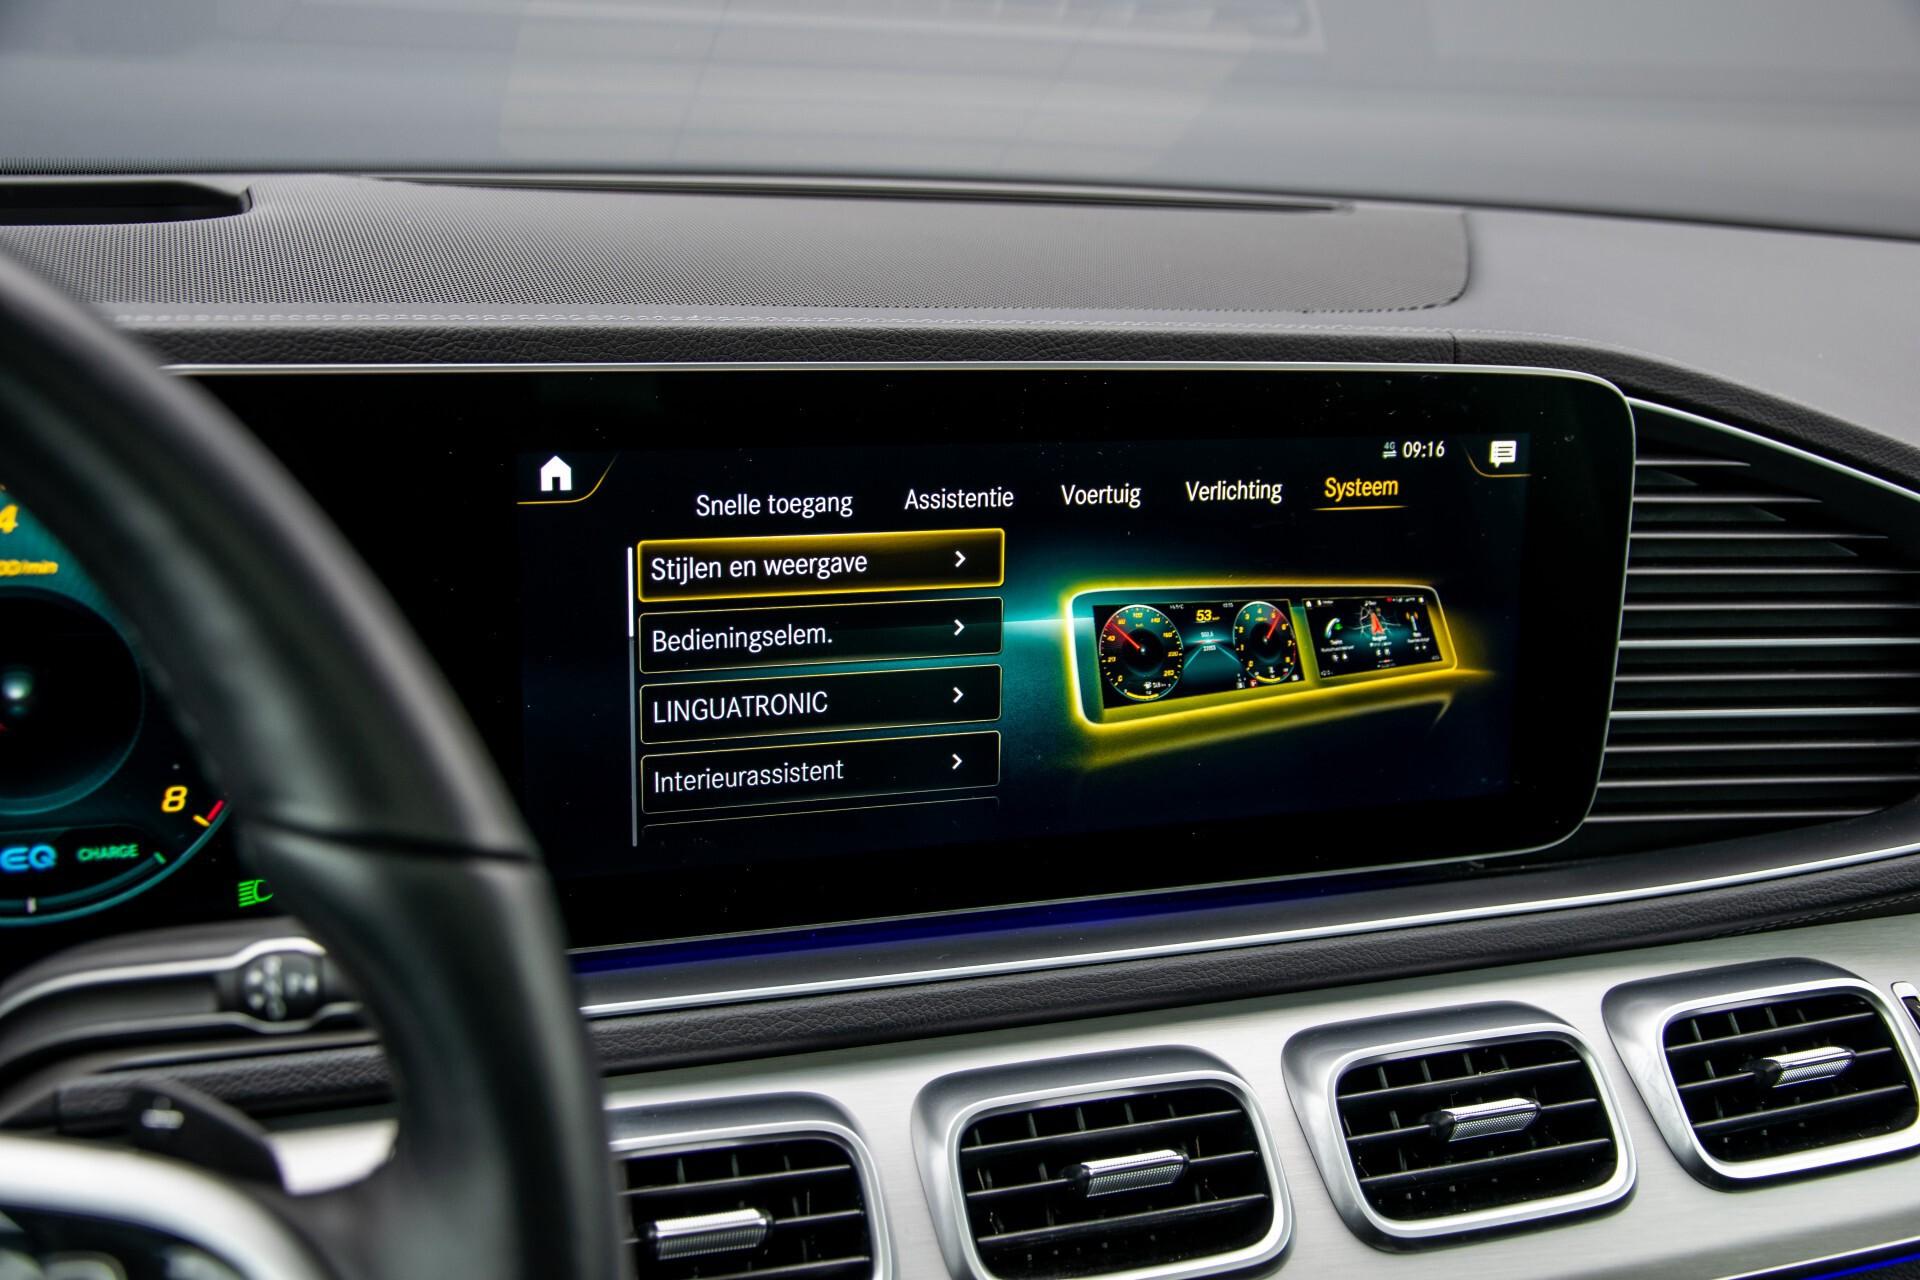 Mercedes-Benz GLE 450 4-M 7-Persoons AMG Massage/Rij-assist/Keyless/TV/360/Night/Trekhaak Aut9 Foto 52